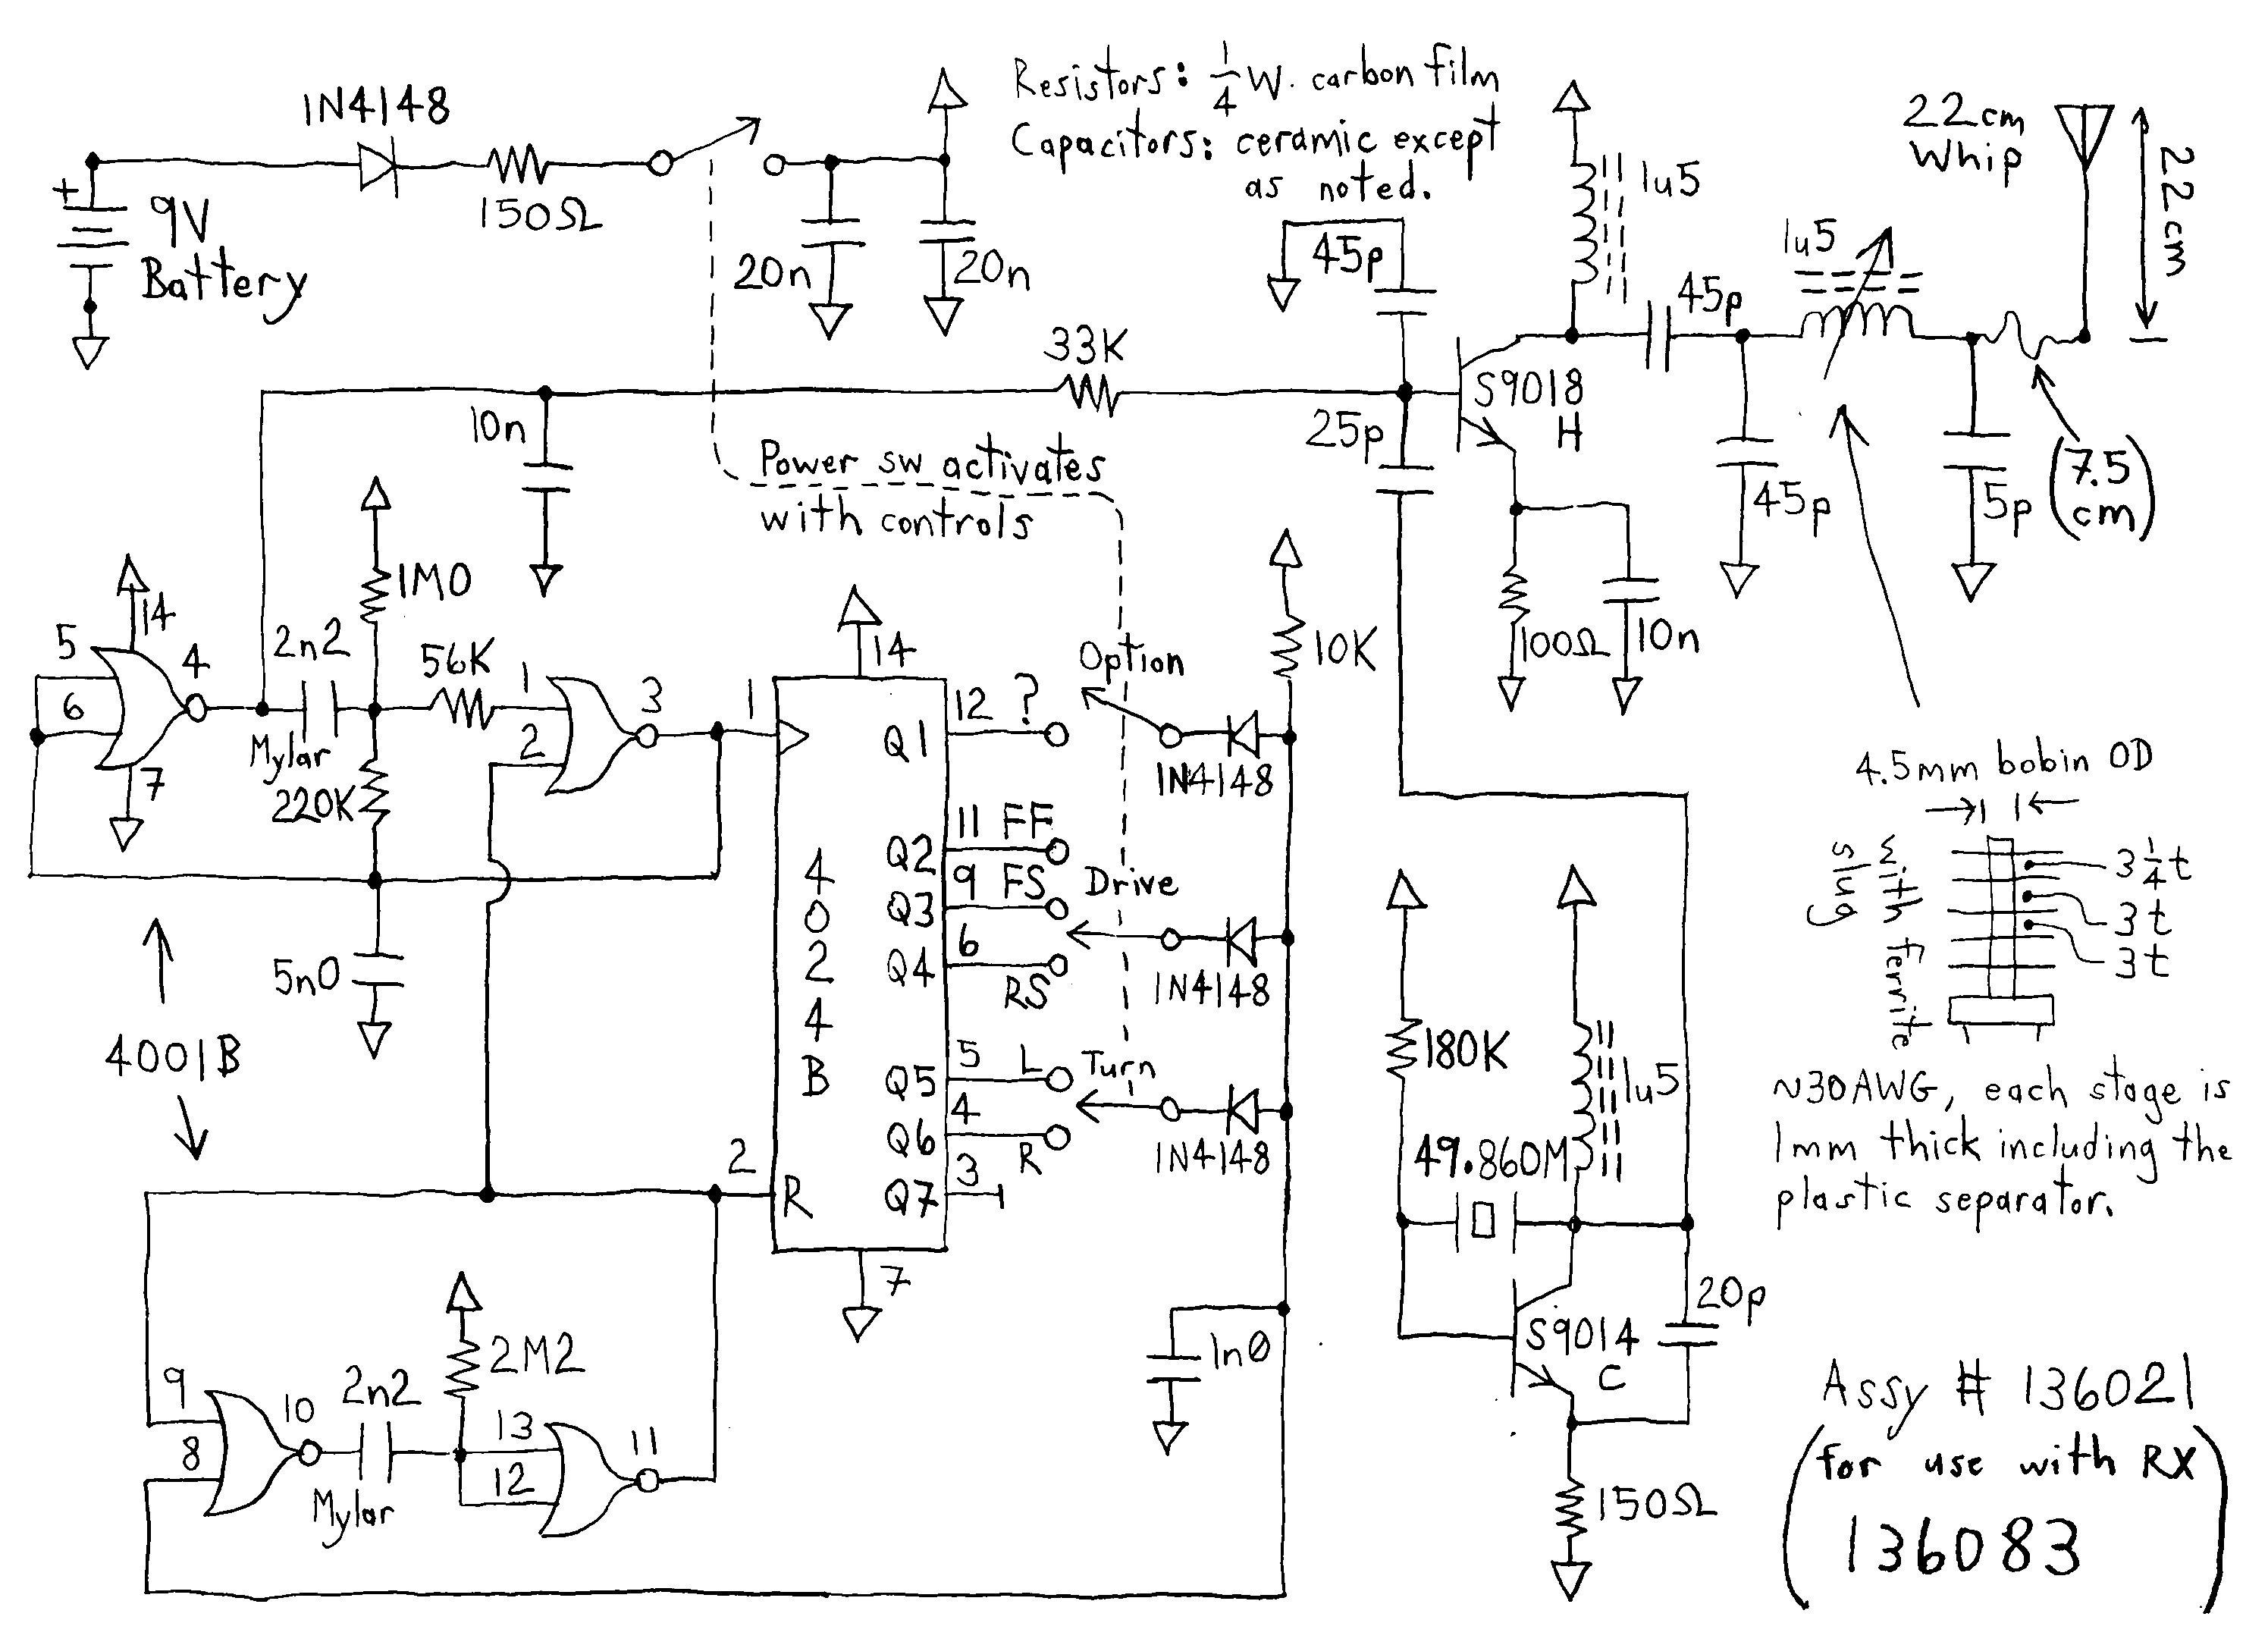 Mack Truck Fuse Box Diagram Car Inverter Wiring Diagram New Luxury Wiring Diagram Zen Car Car Of Mack Truck Fuse Box Diagram